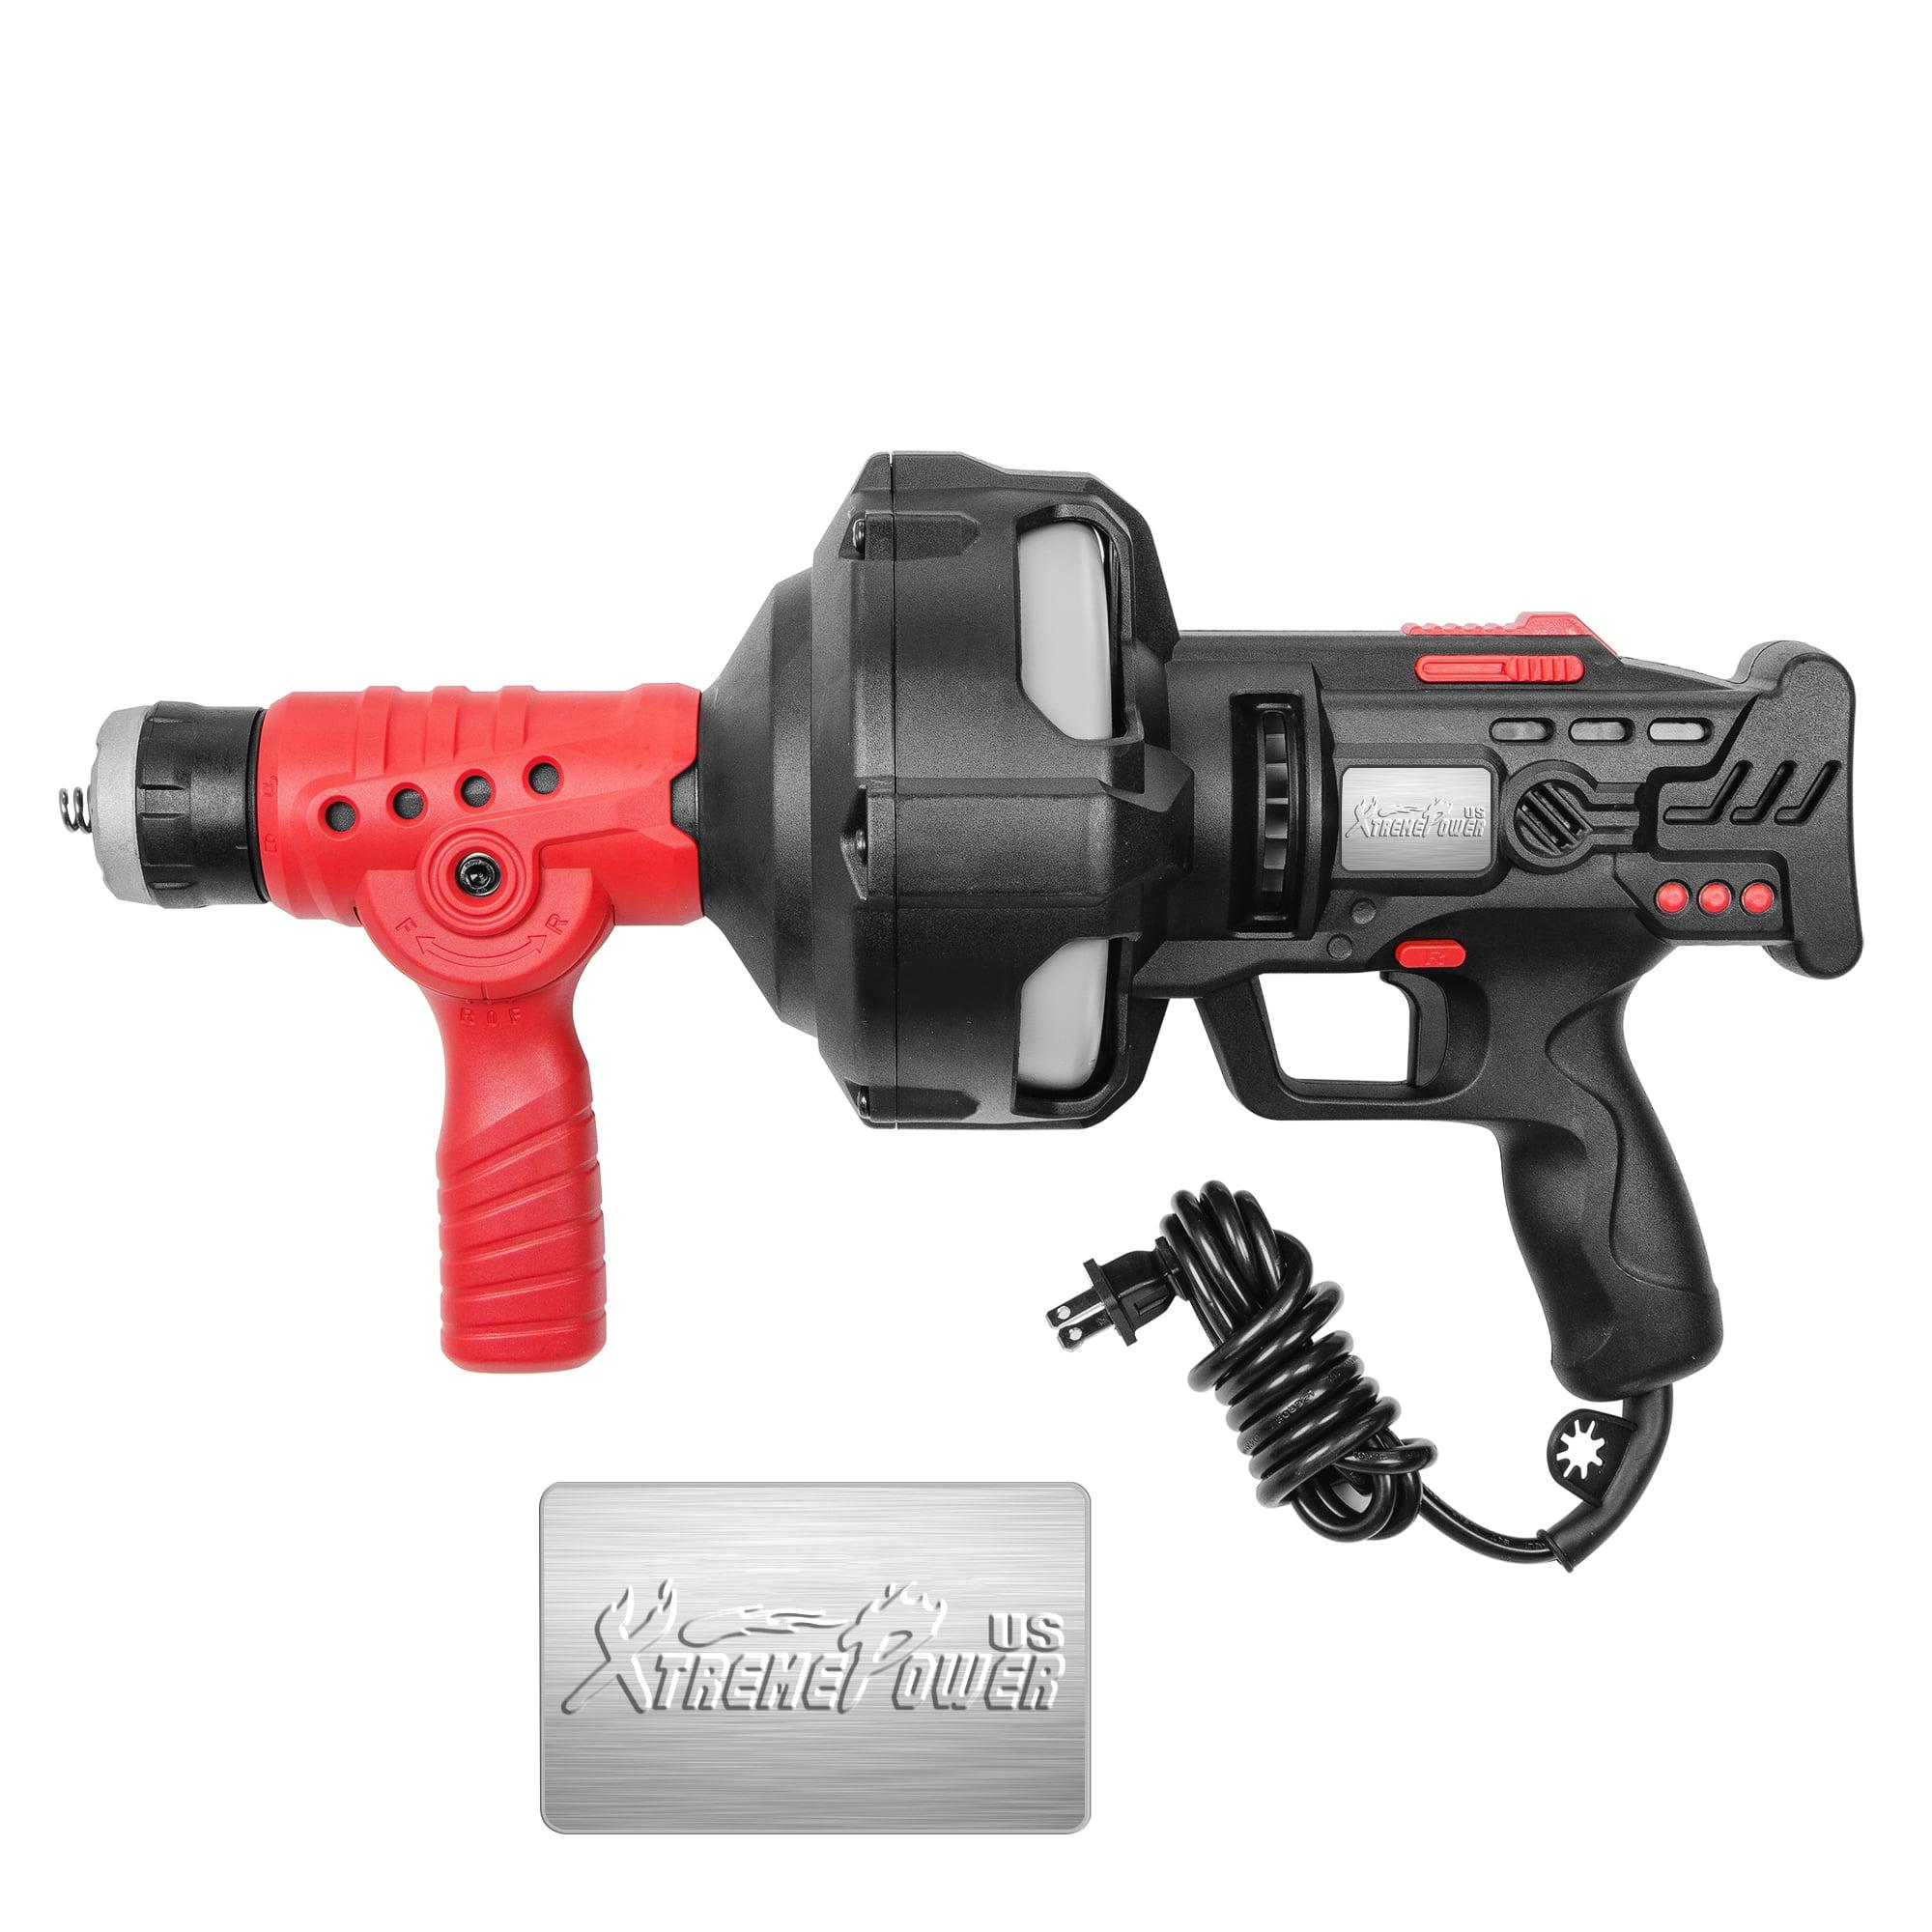 STKUSA 25ft Handheld Portable Electric Plumbing Dredger Cleaner Drain Snake Auger Pipe Cleaner Plumbing Power Tool